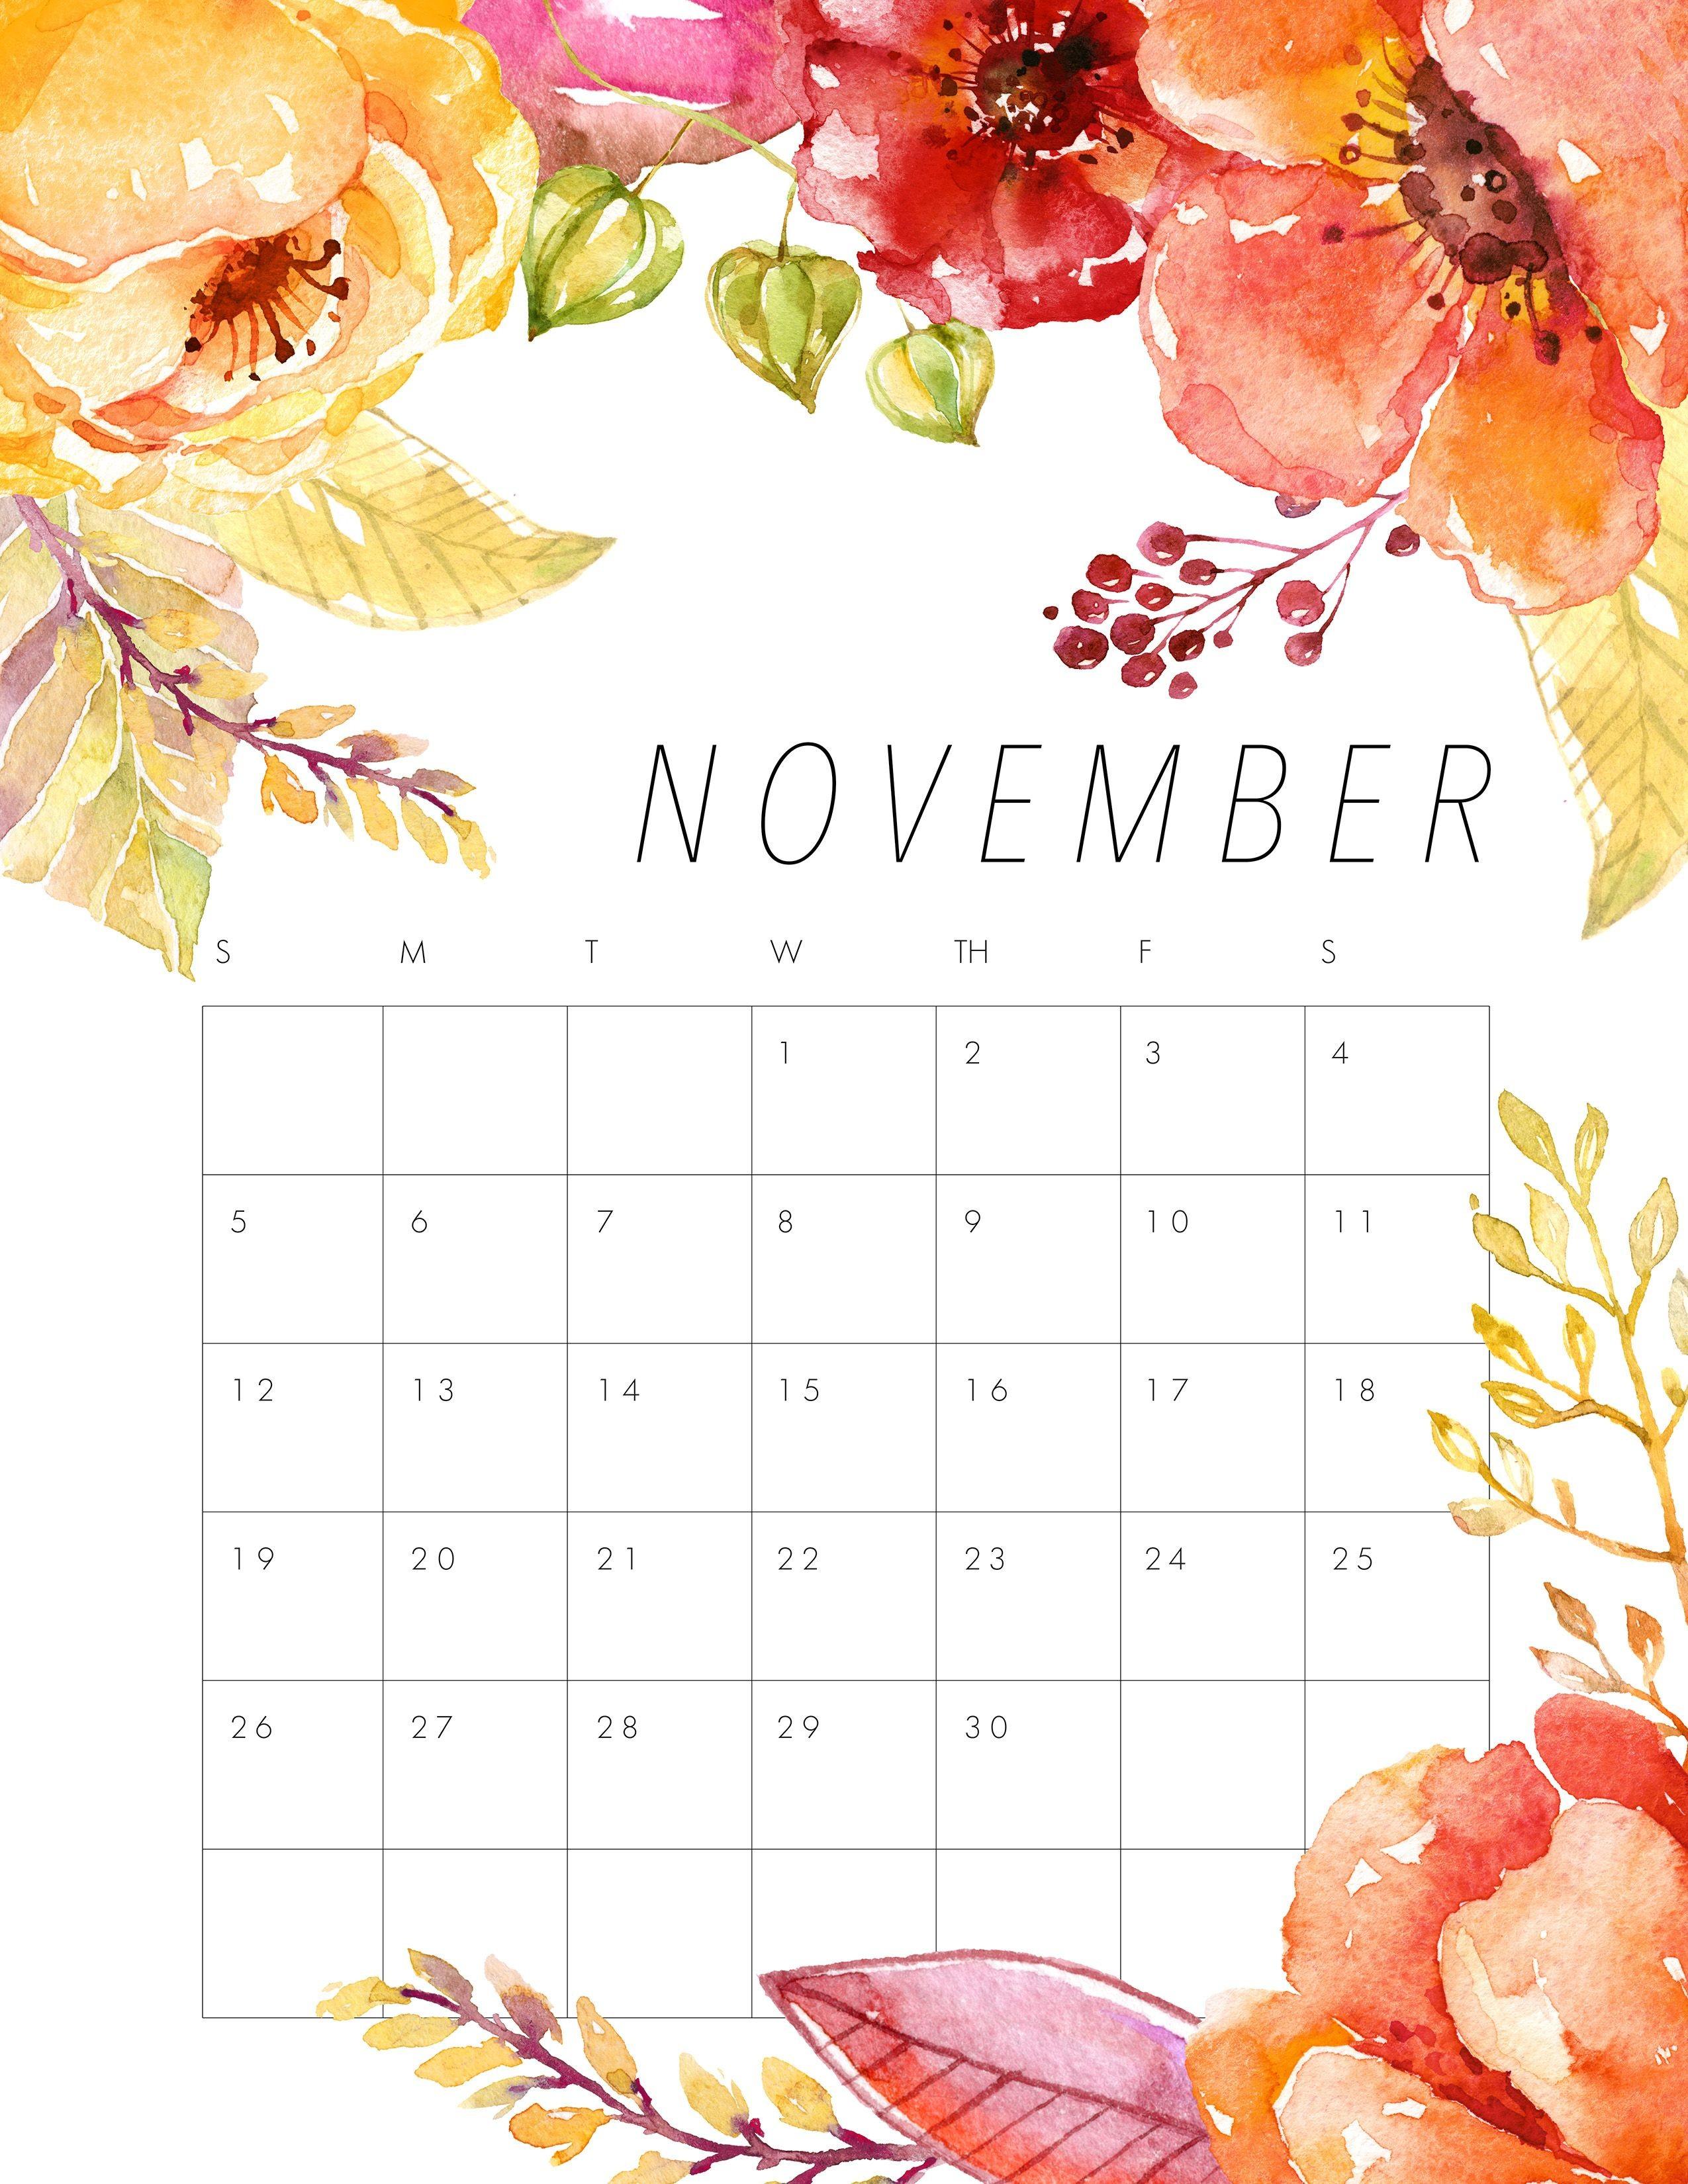 Calendario Mayo 2017 Para Imprimir Word Recientes Pin by Tara On Stationary Pinterest Of Calendario Mayo 2017 Para Imprimir Word Más Recientemente Liberado Calendario 2018 Más De 150 Plantillas Para Imprimir Y Descargar